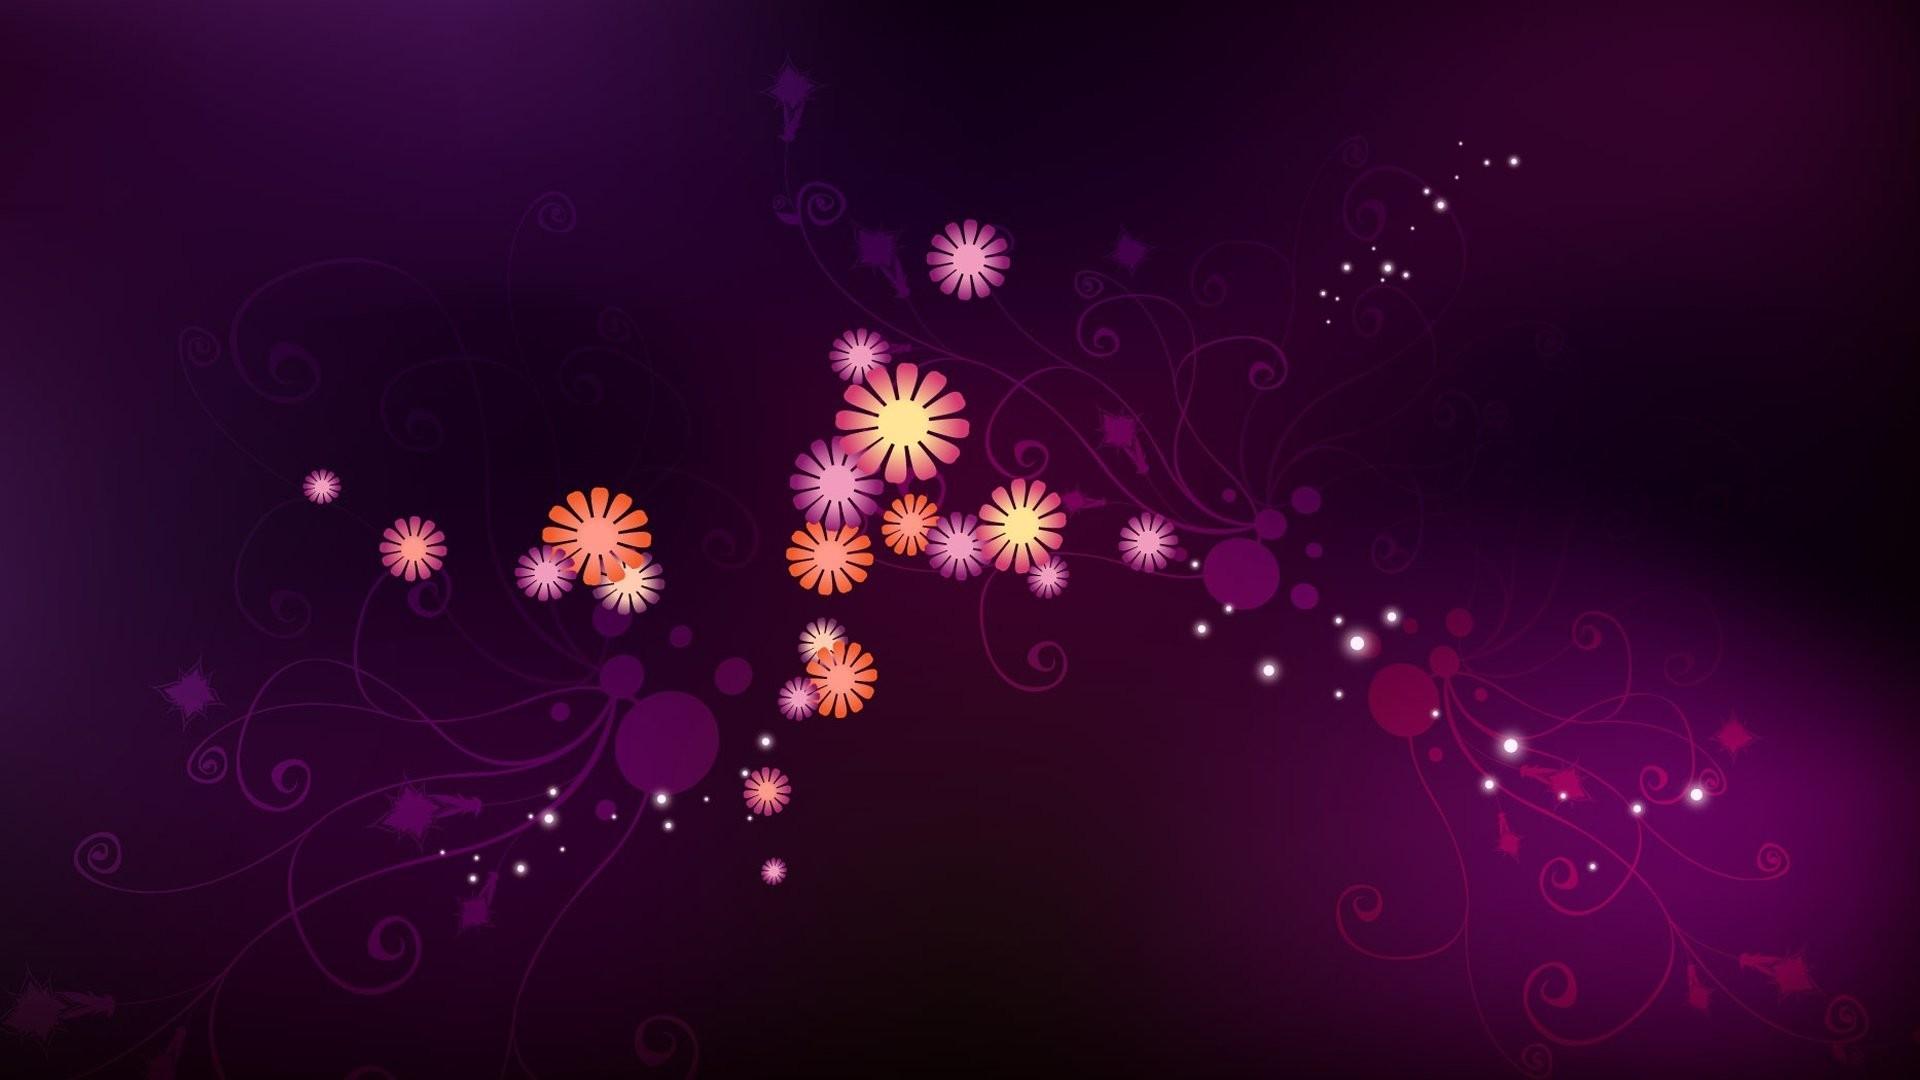 Purple Wallpapers 12 Best Wallpapers Collection Desktop: Pretty Wallpaper For Desktop (50+ Images